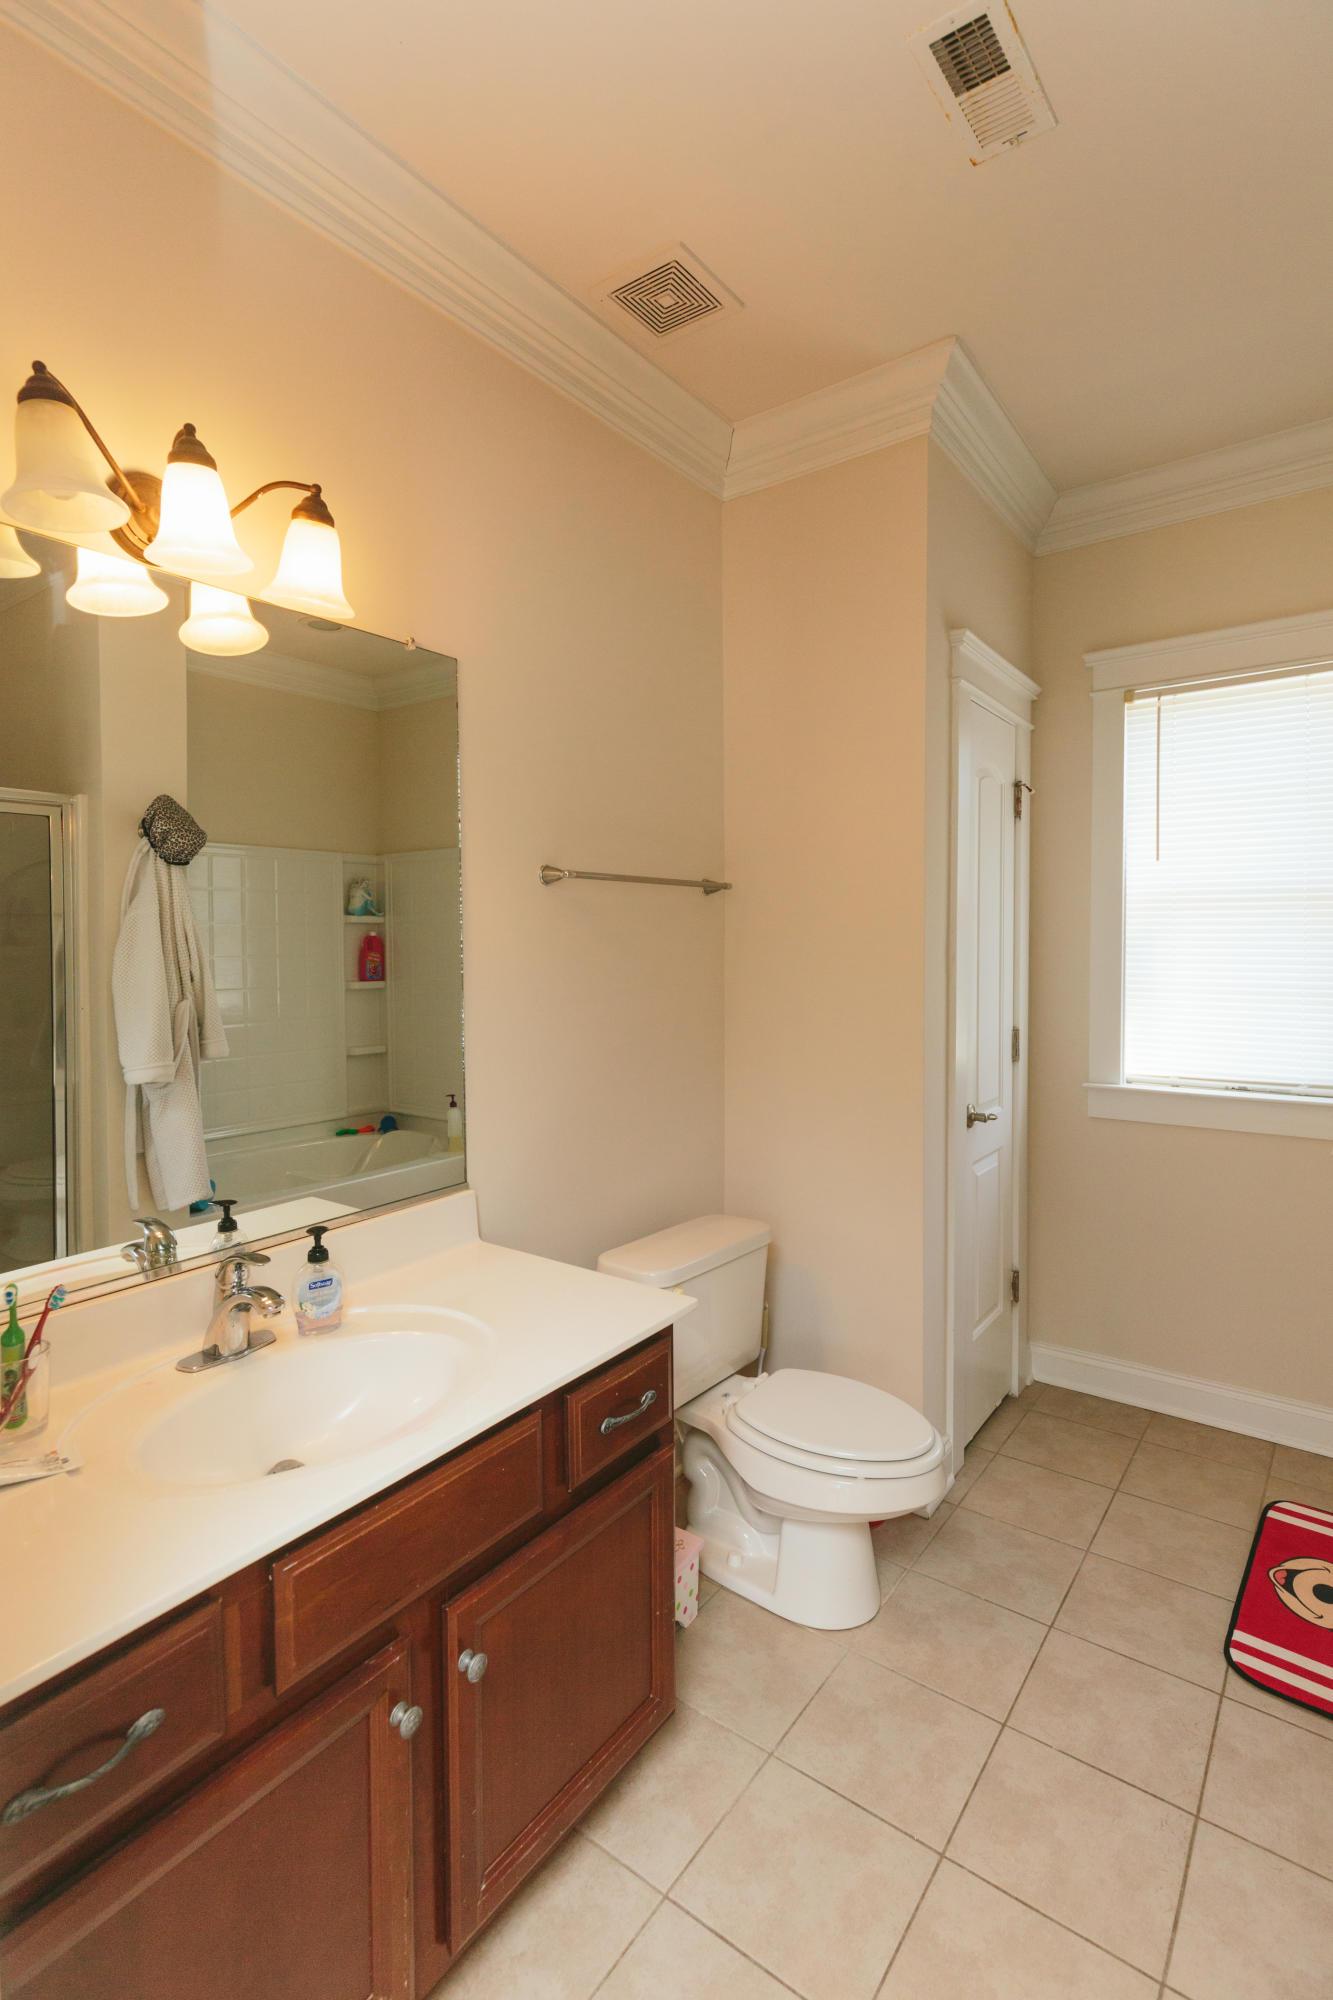 Legend Oaks Plantation Homes For Sale - 107 Heart Pine, Summerville, SC - 8